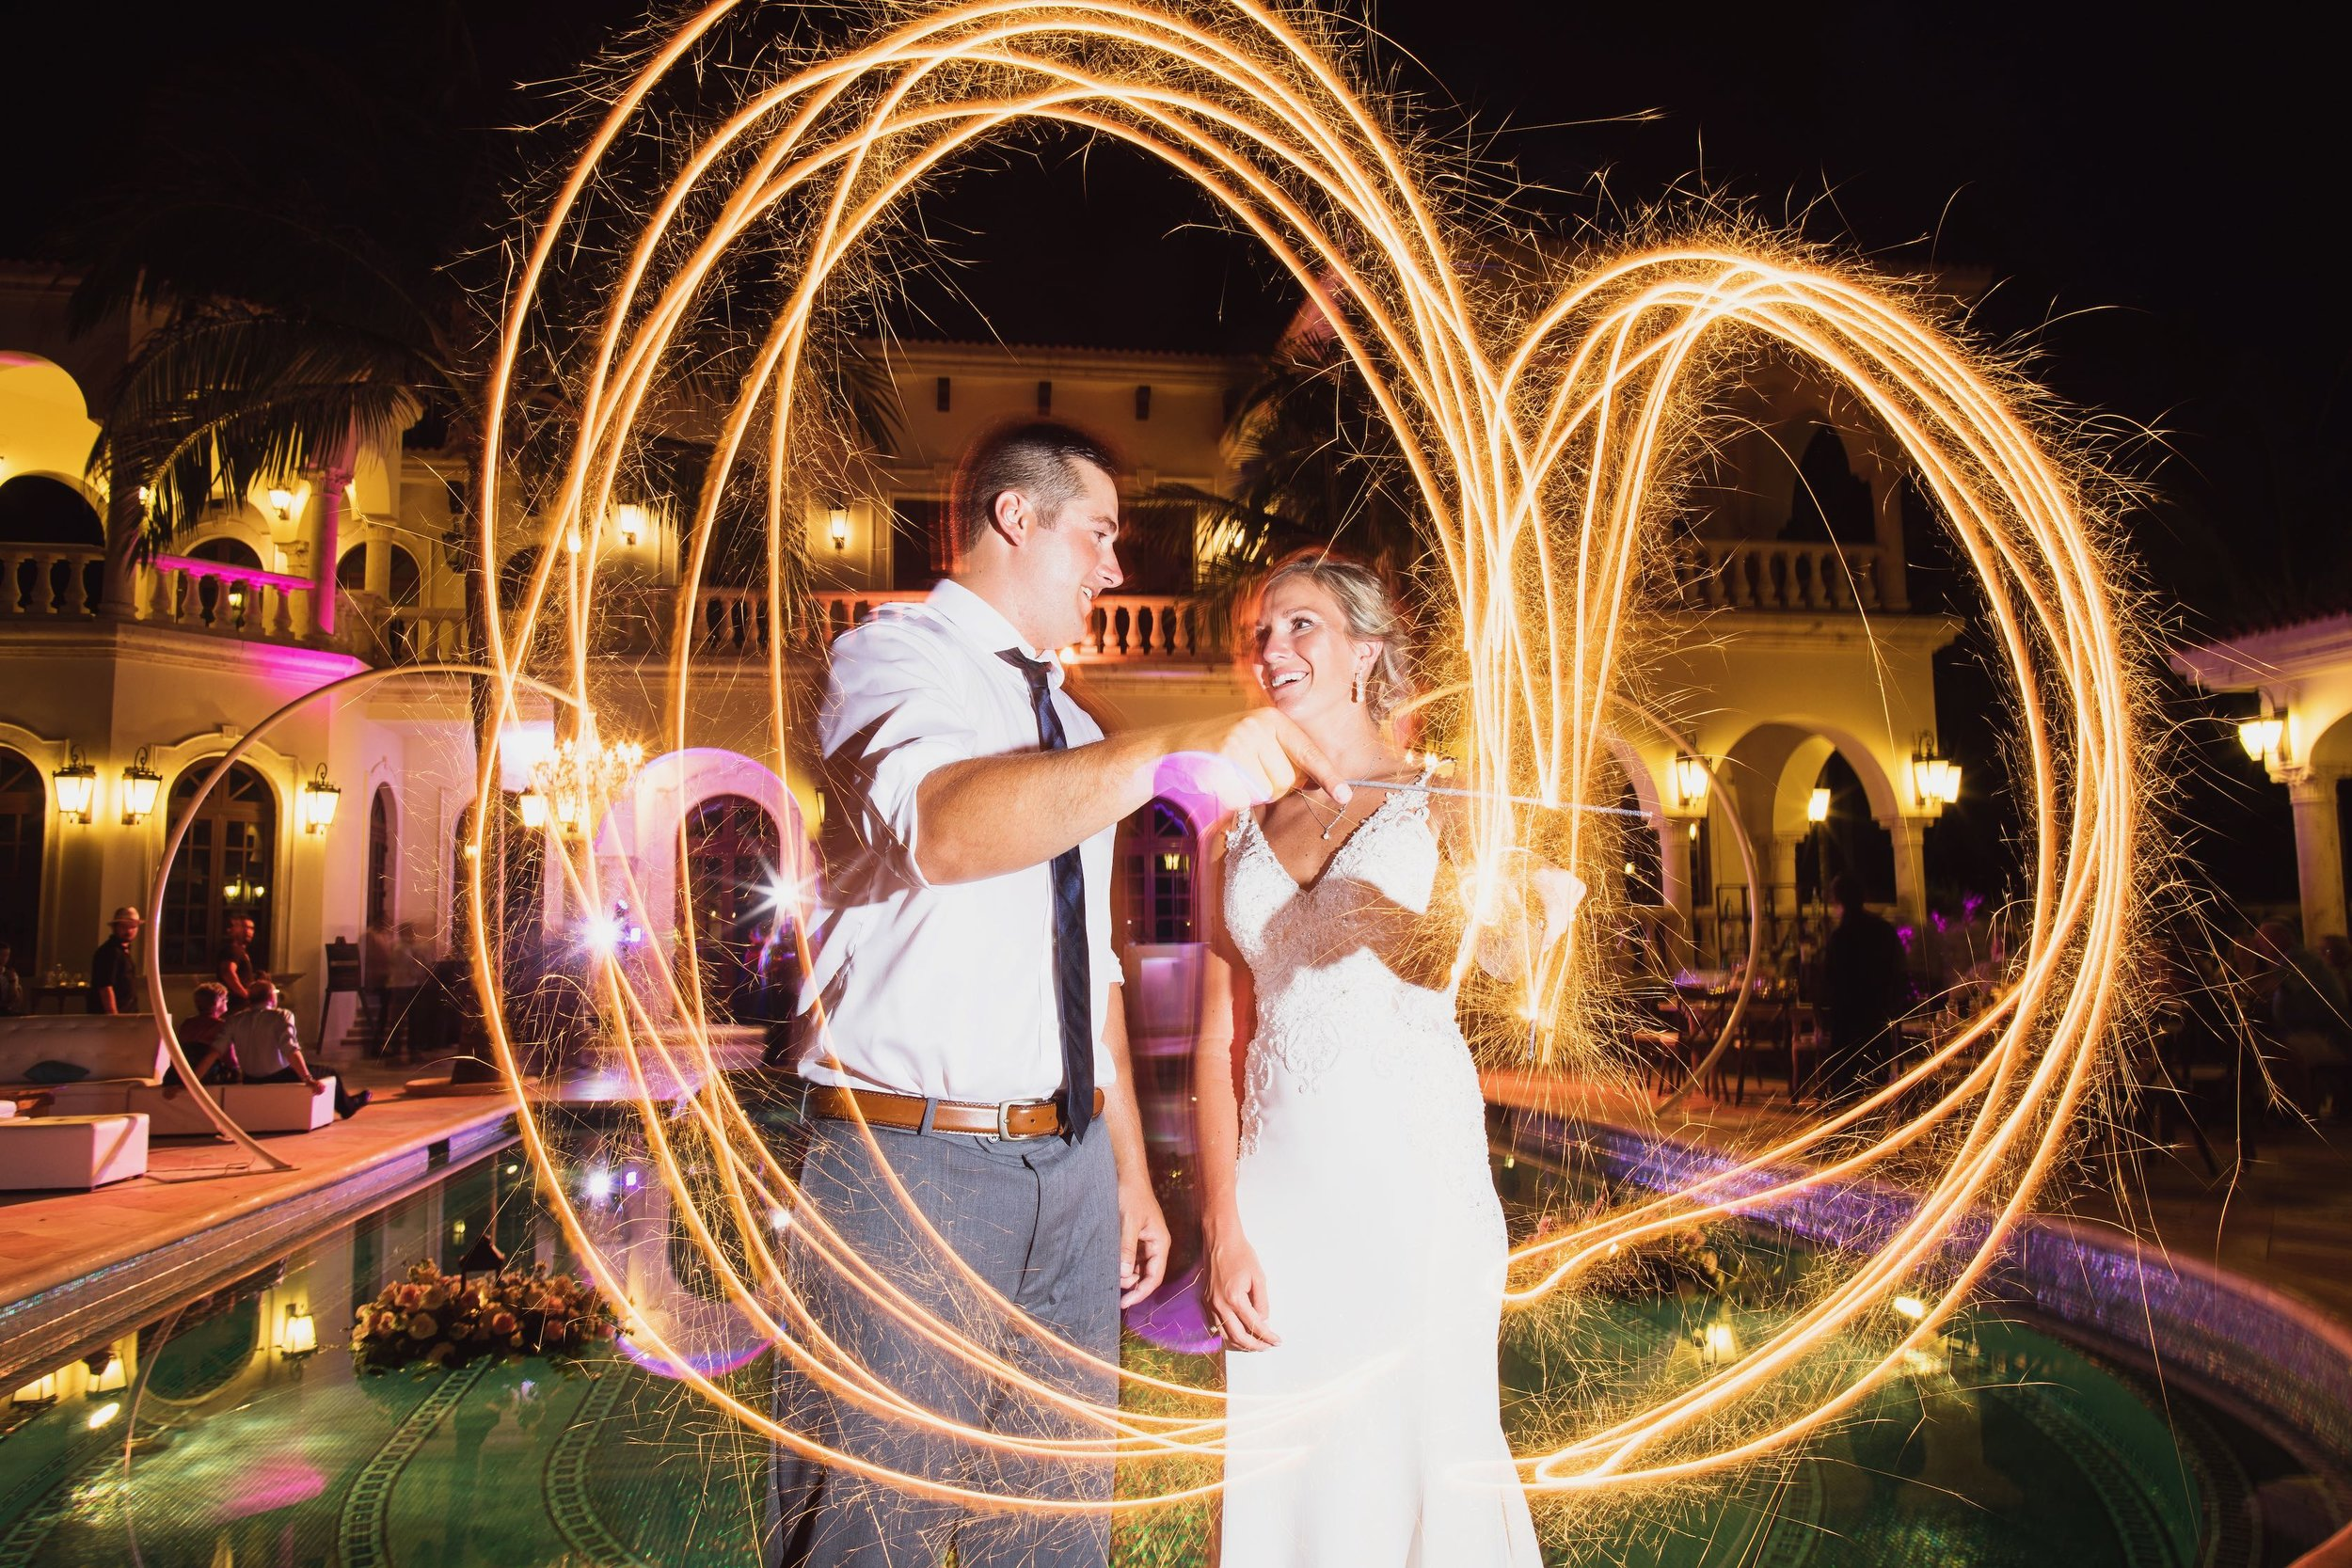 cancun-wedding-venue-villa-la-joya-984 copy-websize.jpg